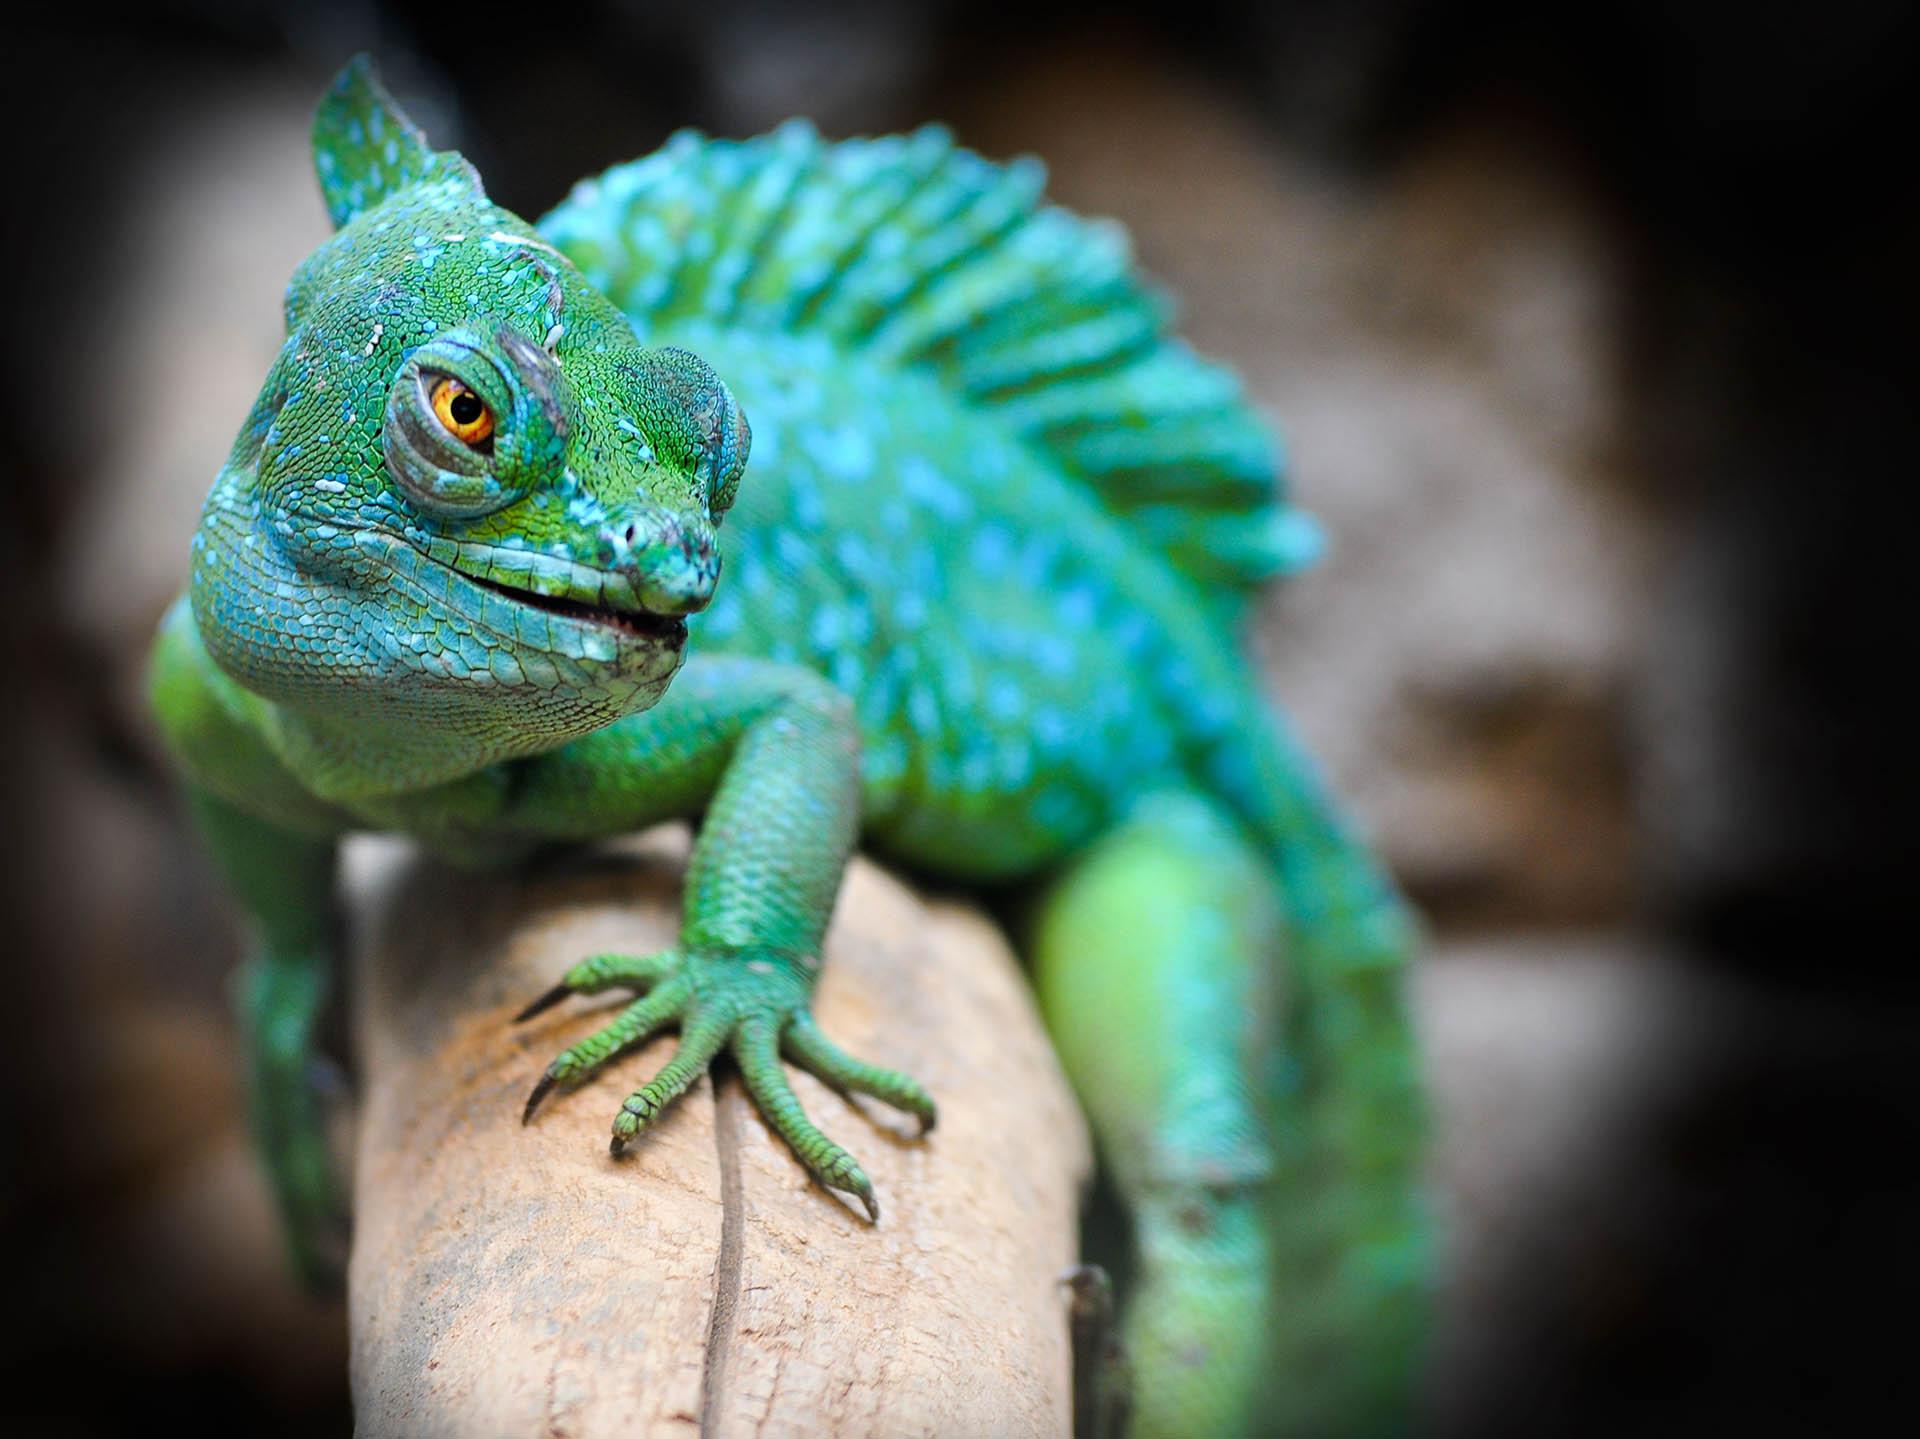 Costa Rica - Green Lizard